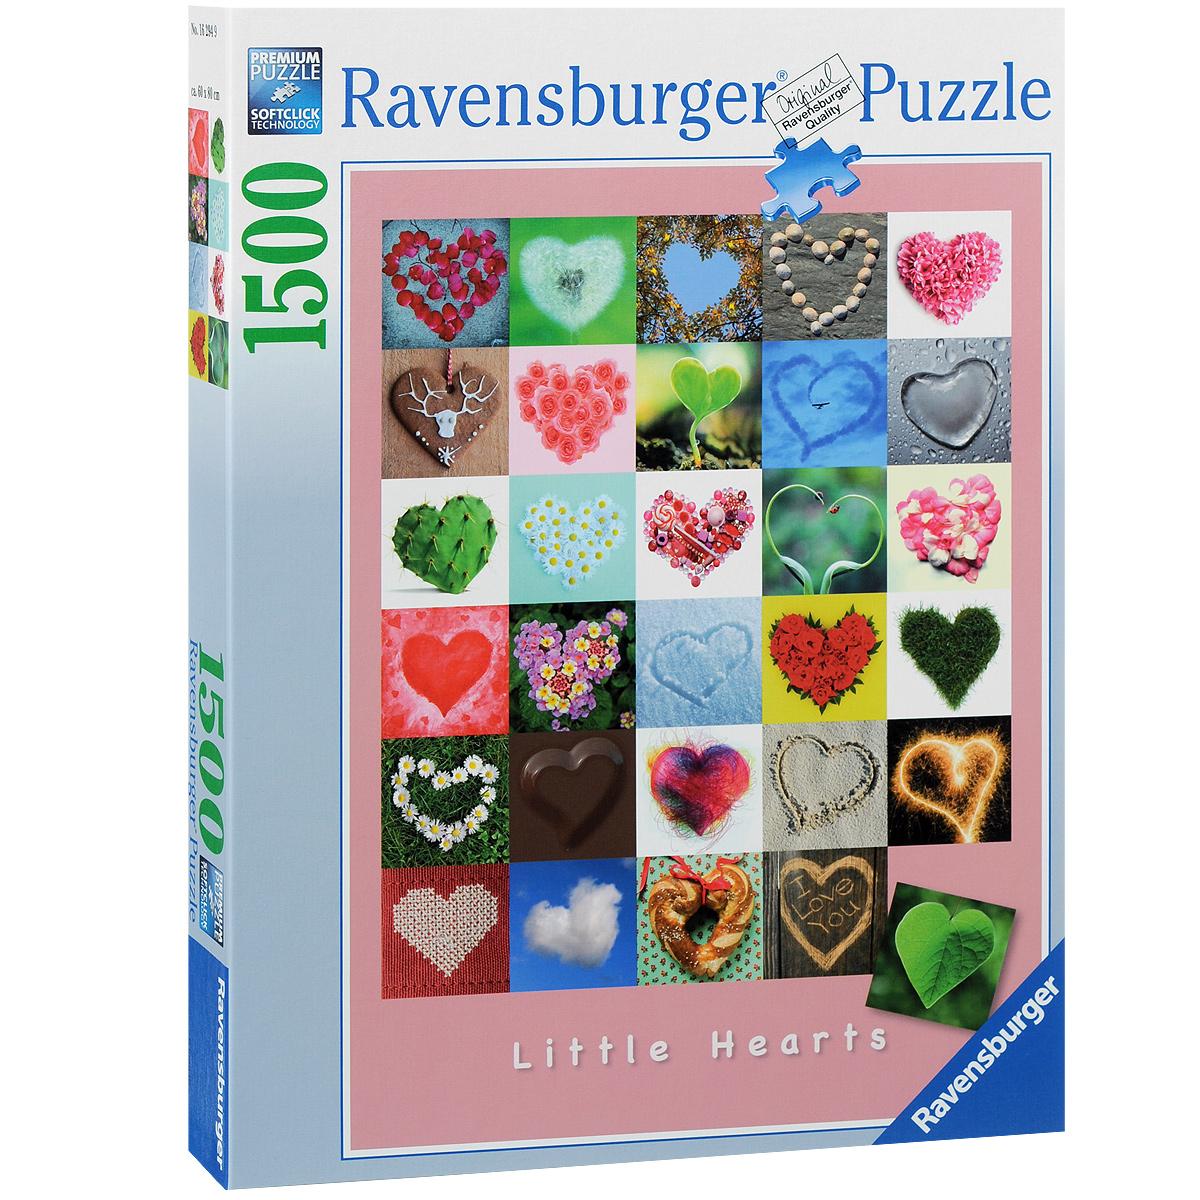 Ravensburger Галерея сердец. Пазл, 1500 элементов